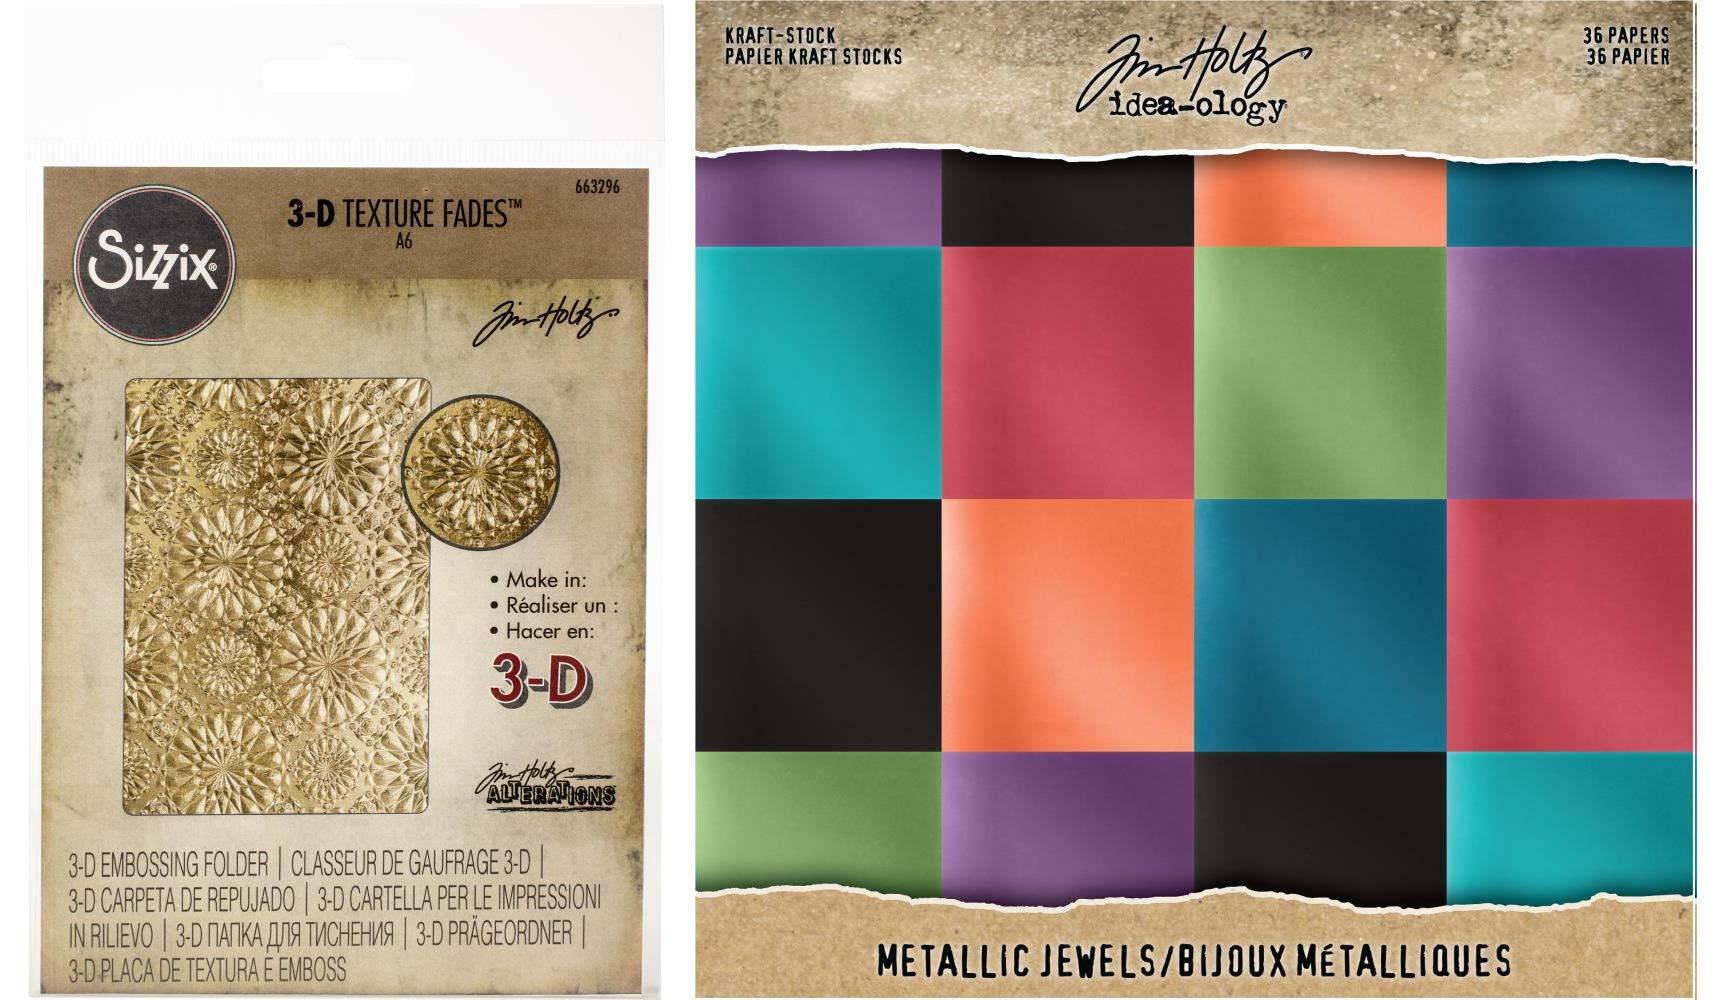 Tim Holtz Sizzix - Kaleidoscope 3D Embossing Folder and Idea-Ology Jewels Metallic Kraft Cardstock - 2 Items by Tim Holtz Sizzix